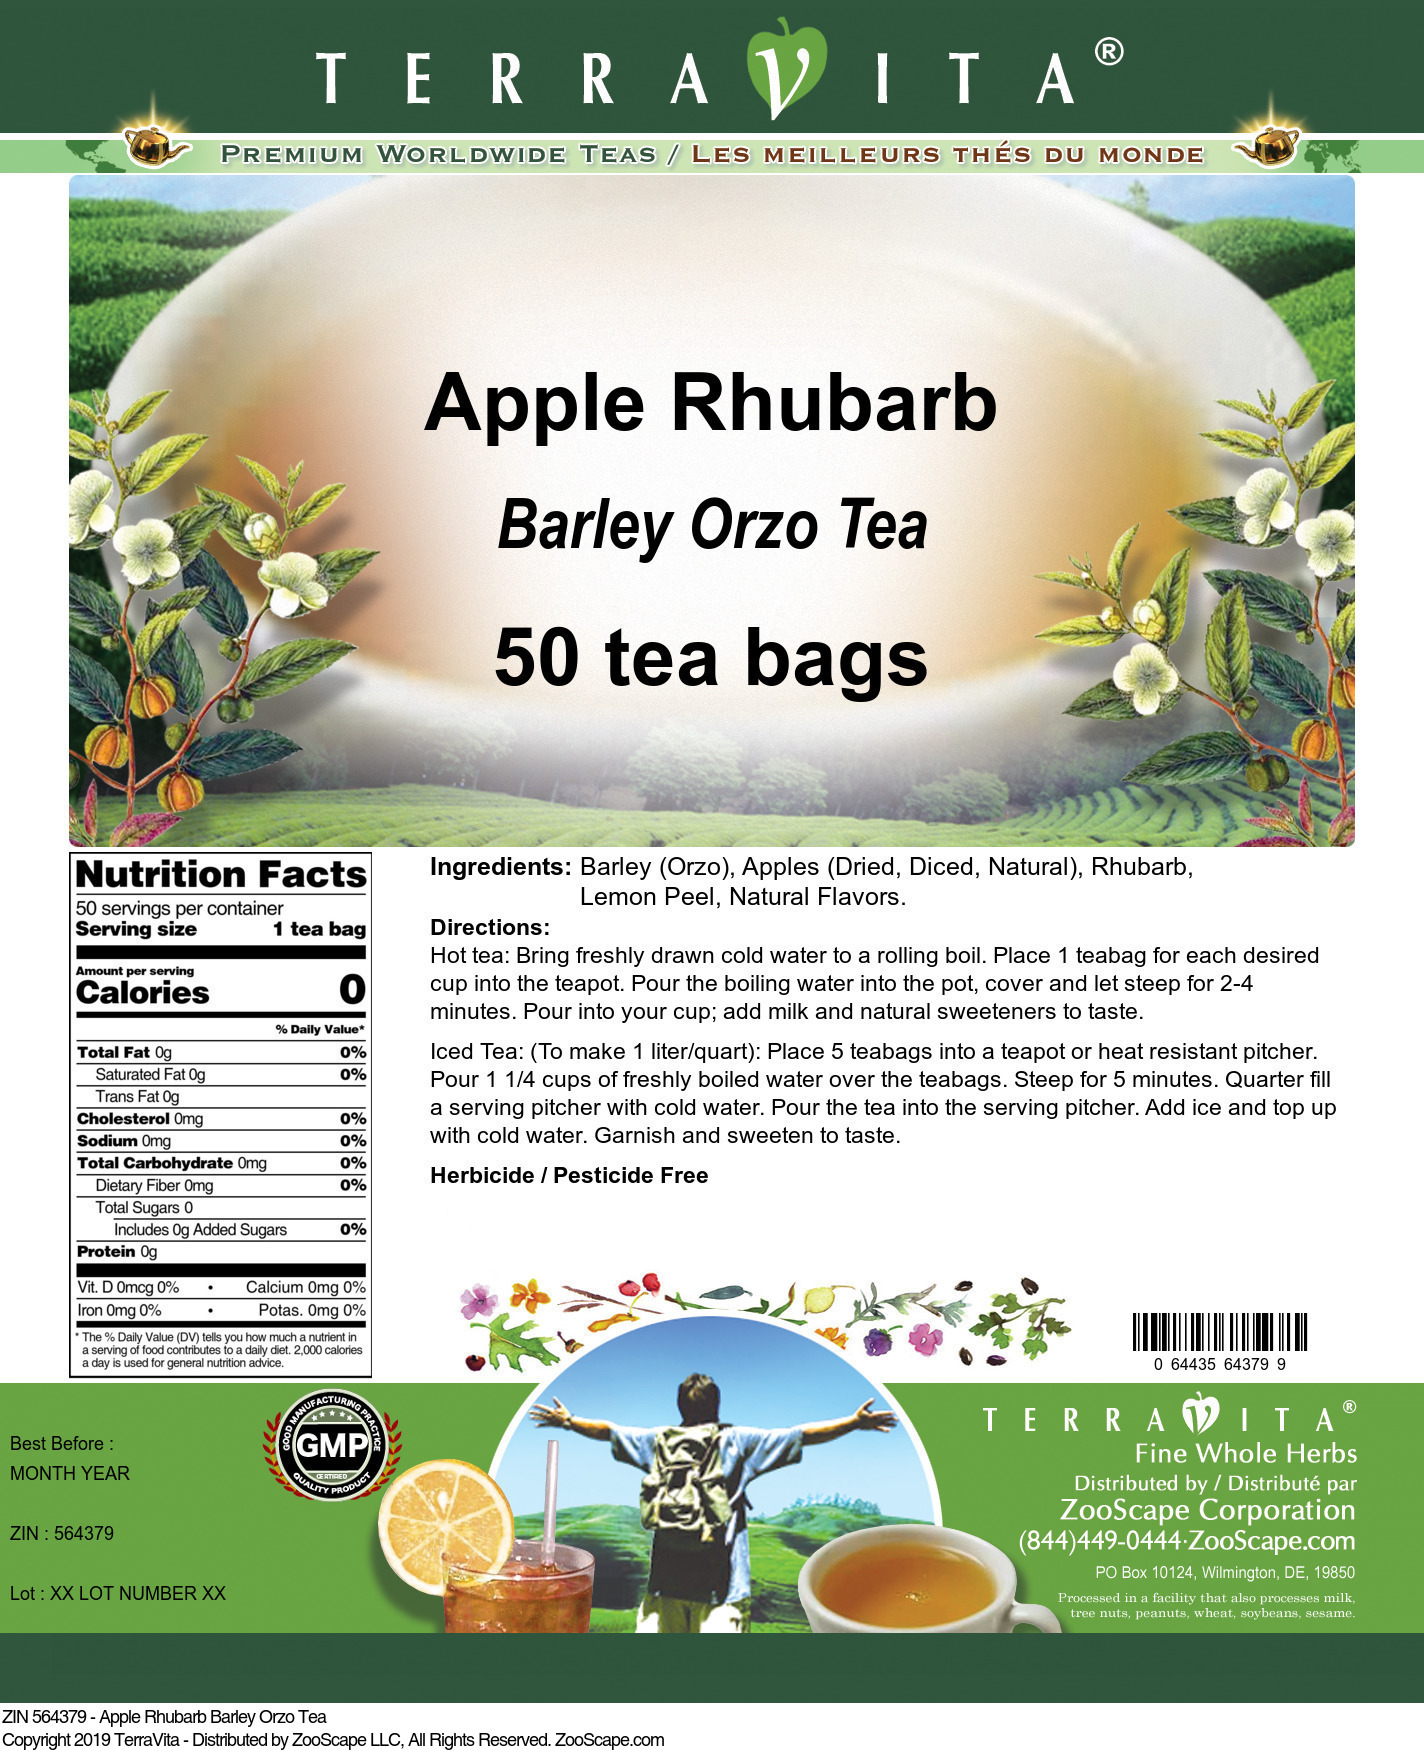 Apple Rhubarb Barley Orzo Tea